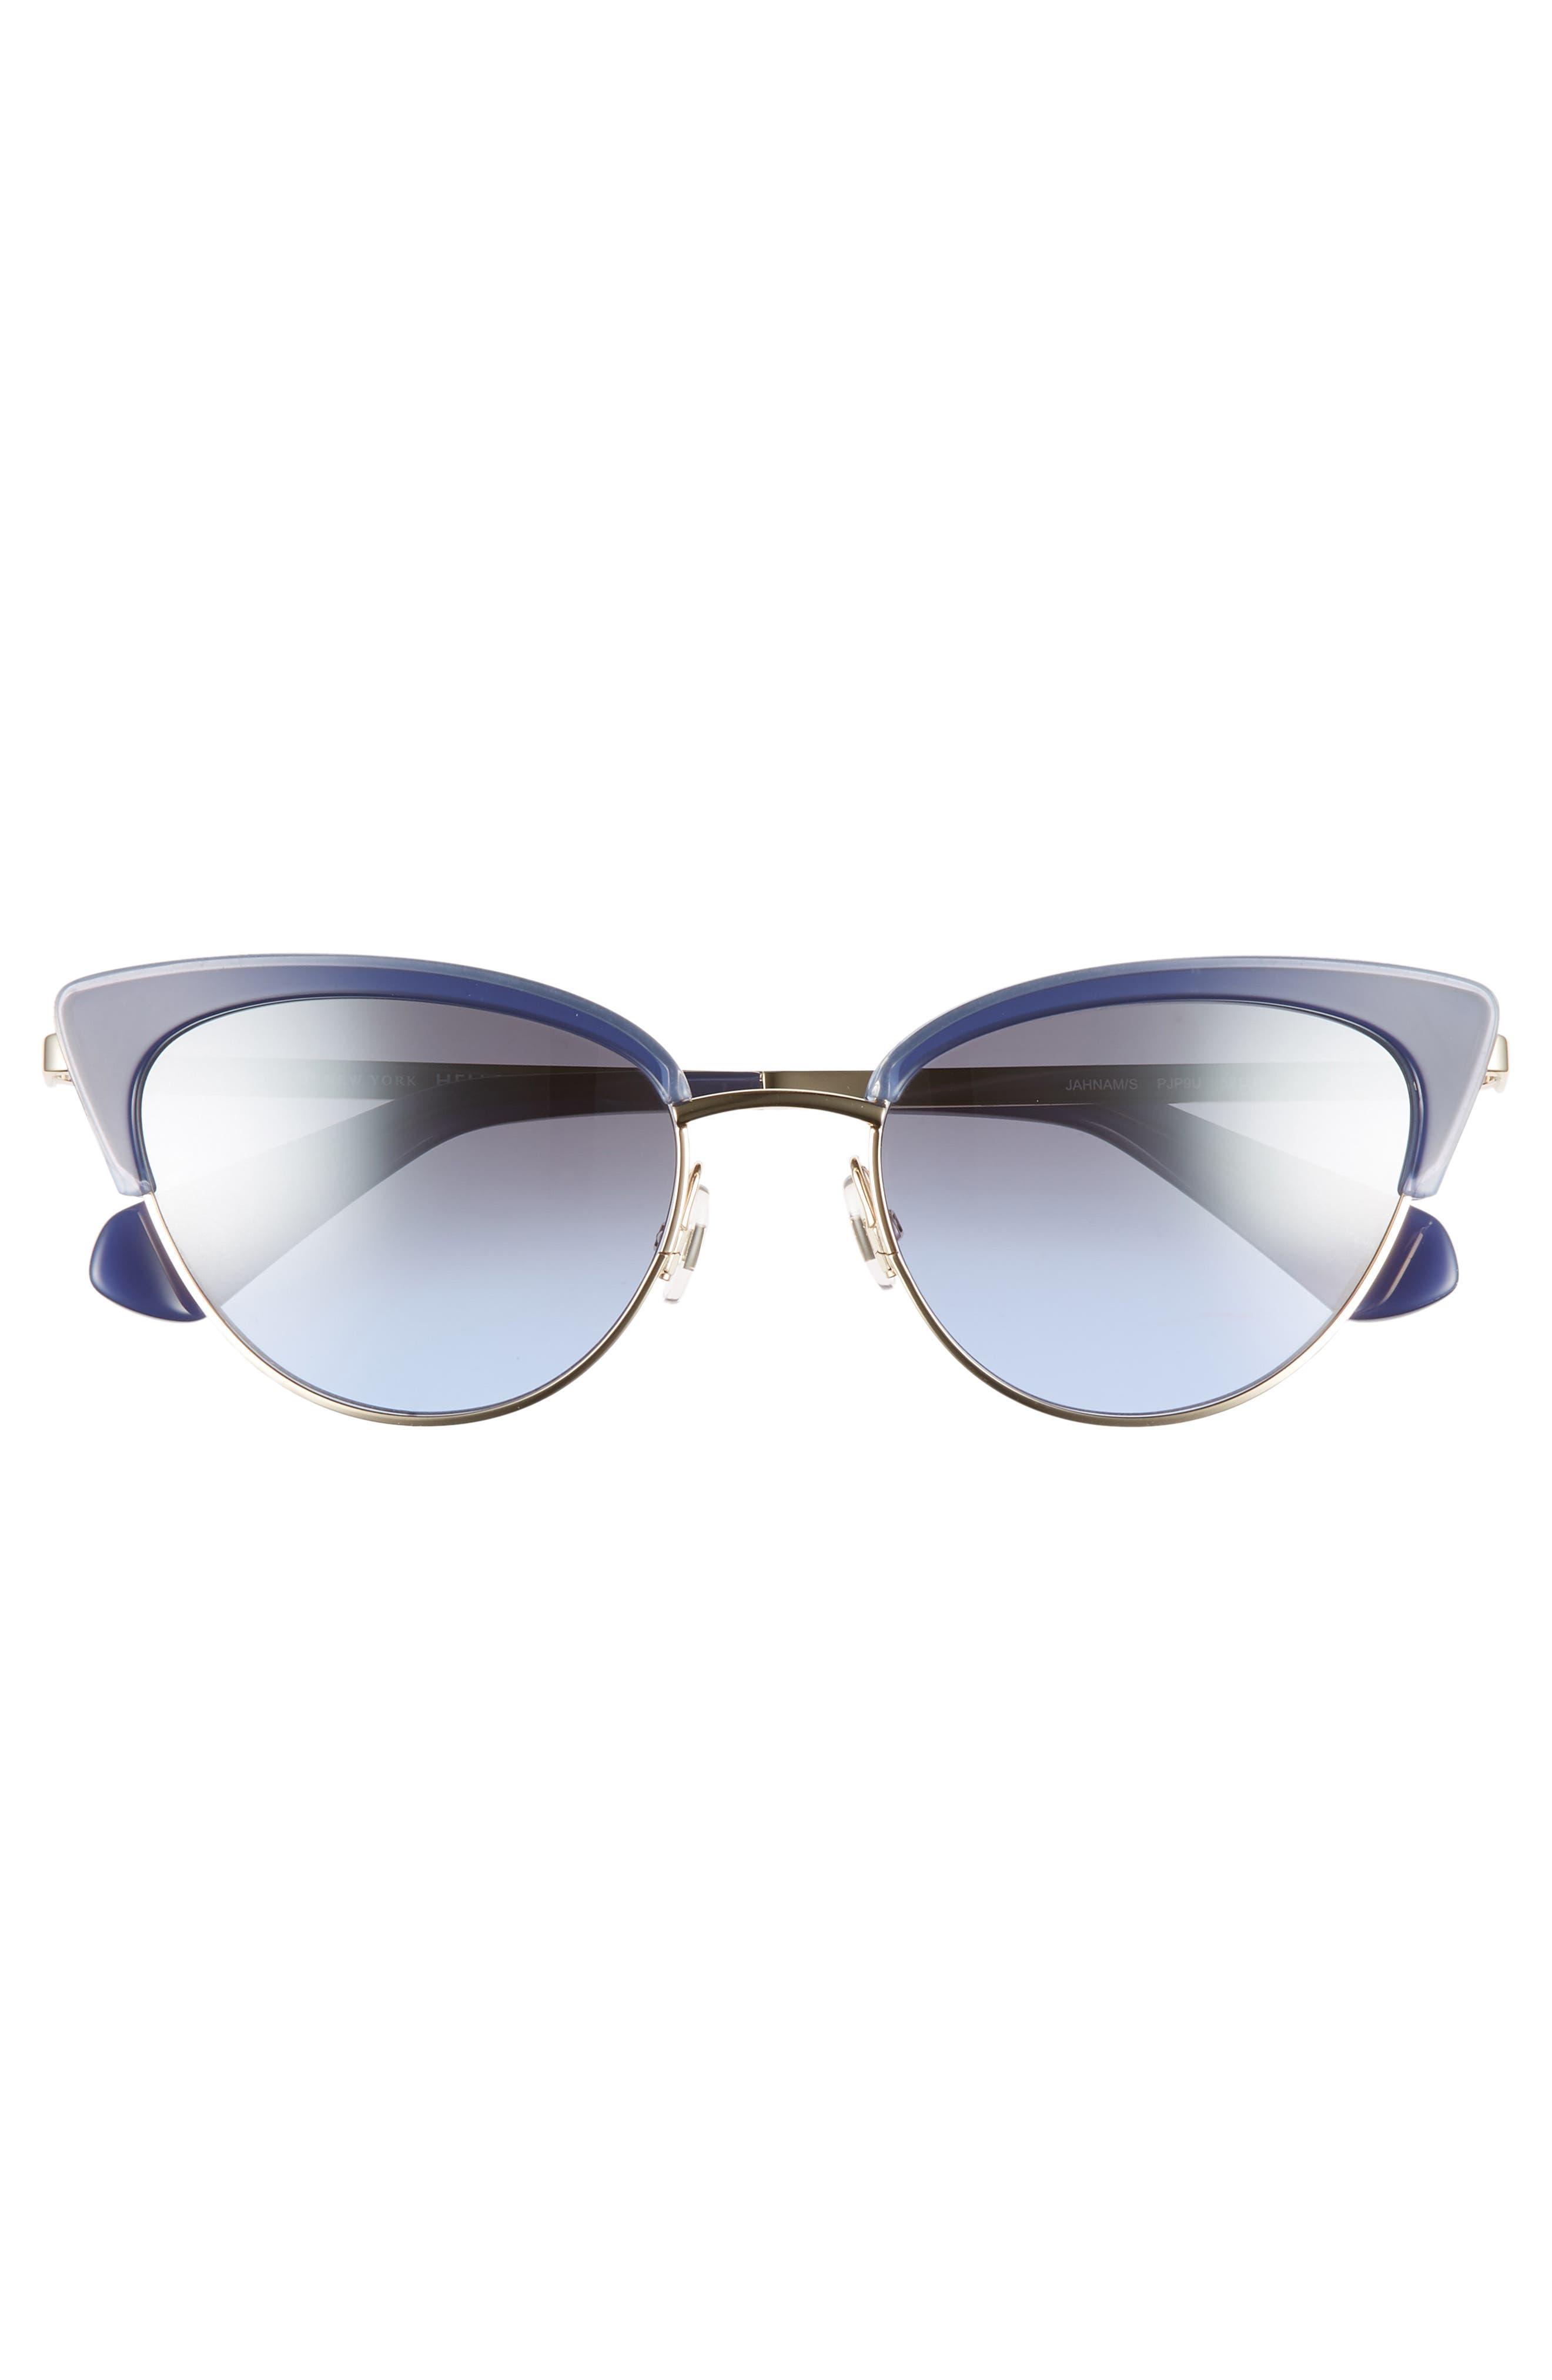 KATE SPADE NEW YORK,                             jahnams 52mm cat eye sunglasses,                             Alternate thumbnail 3, color,                             BLUE